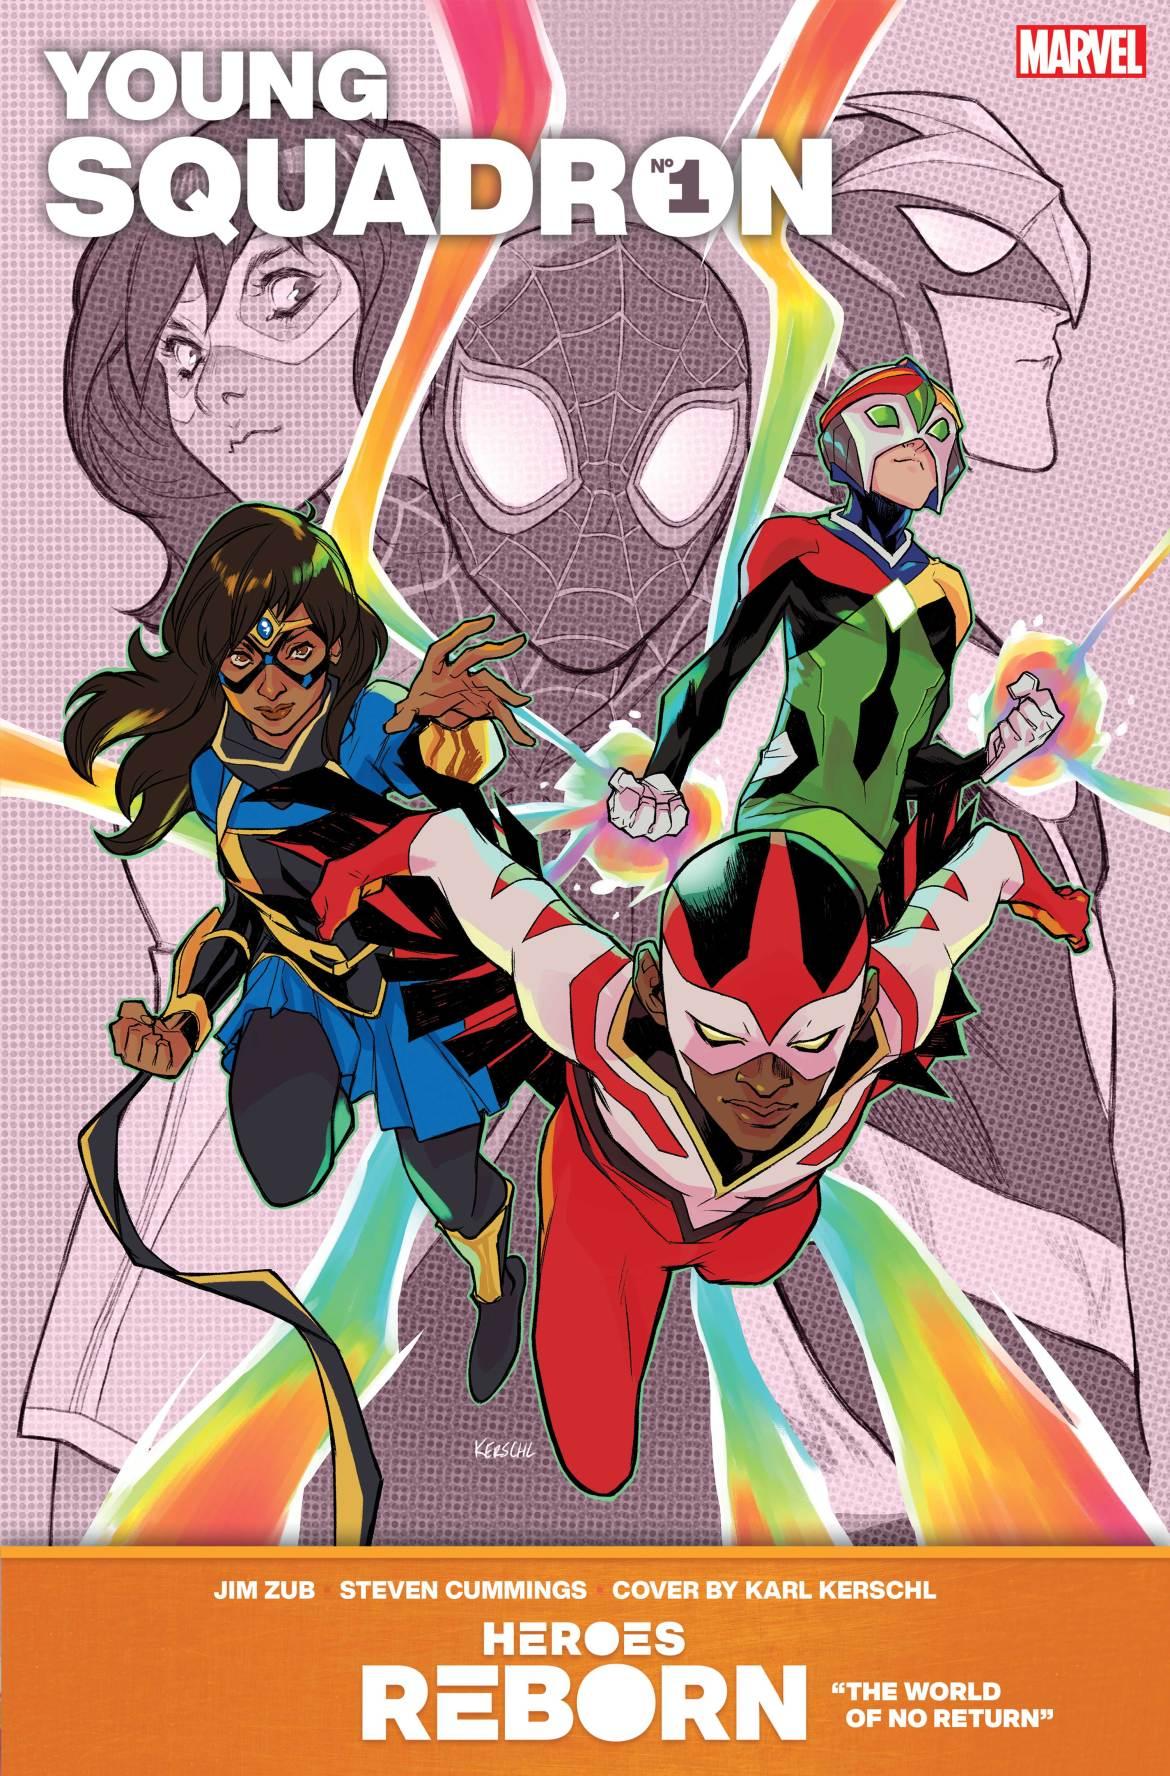 REBORN_YoungSquadron-1 Marvel Comics May 2021 Solicitations